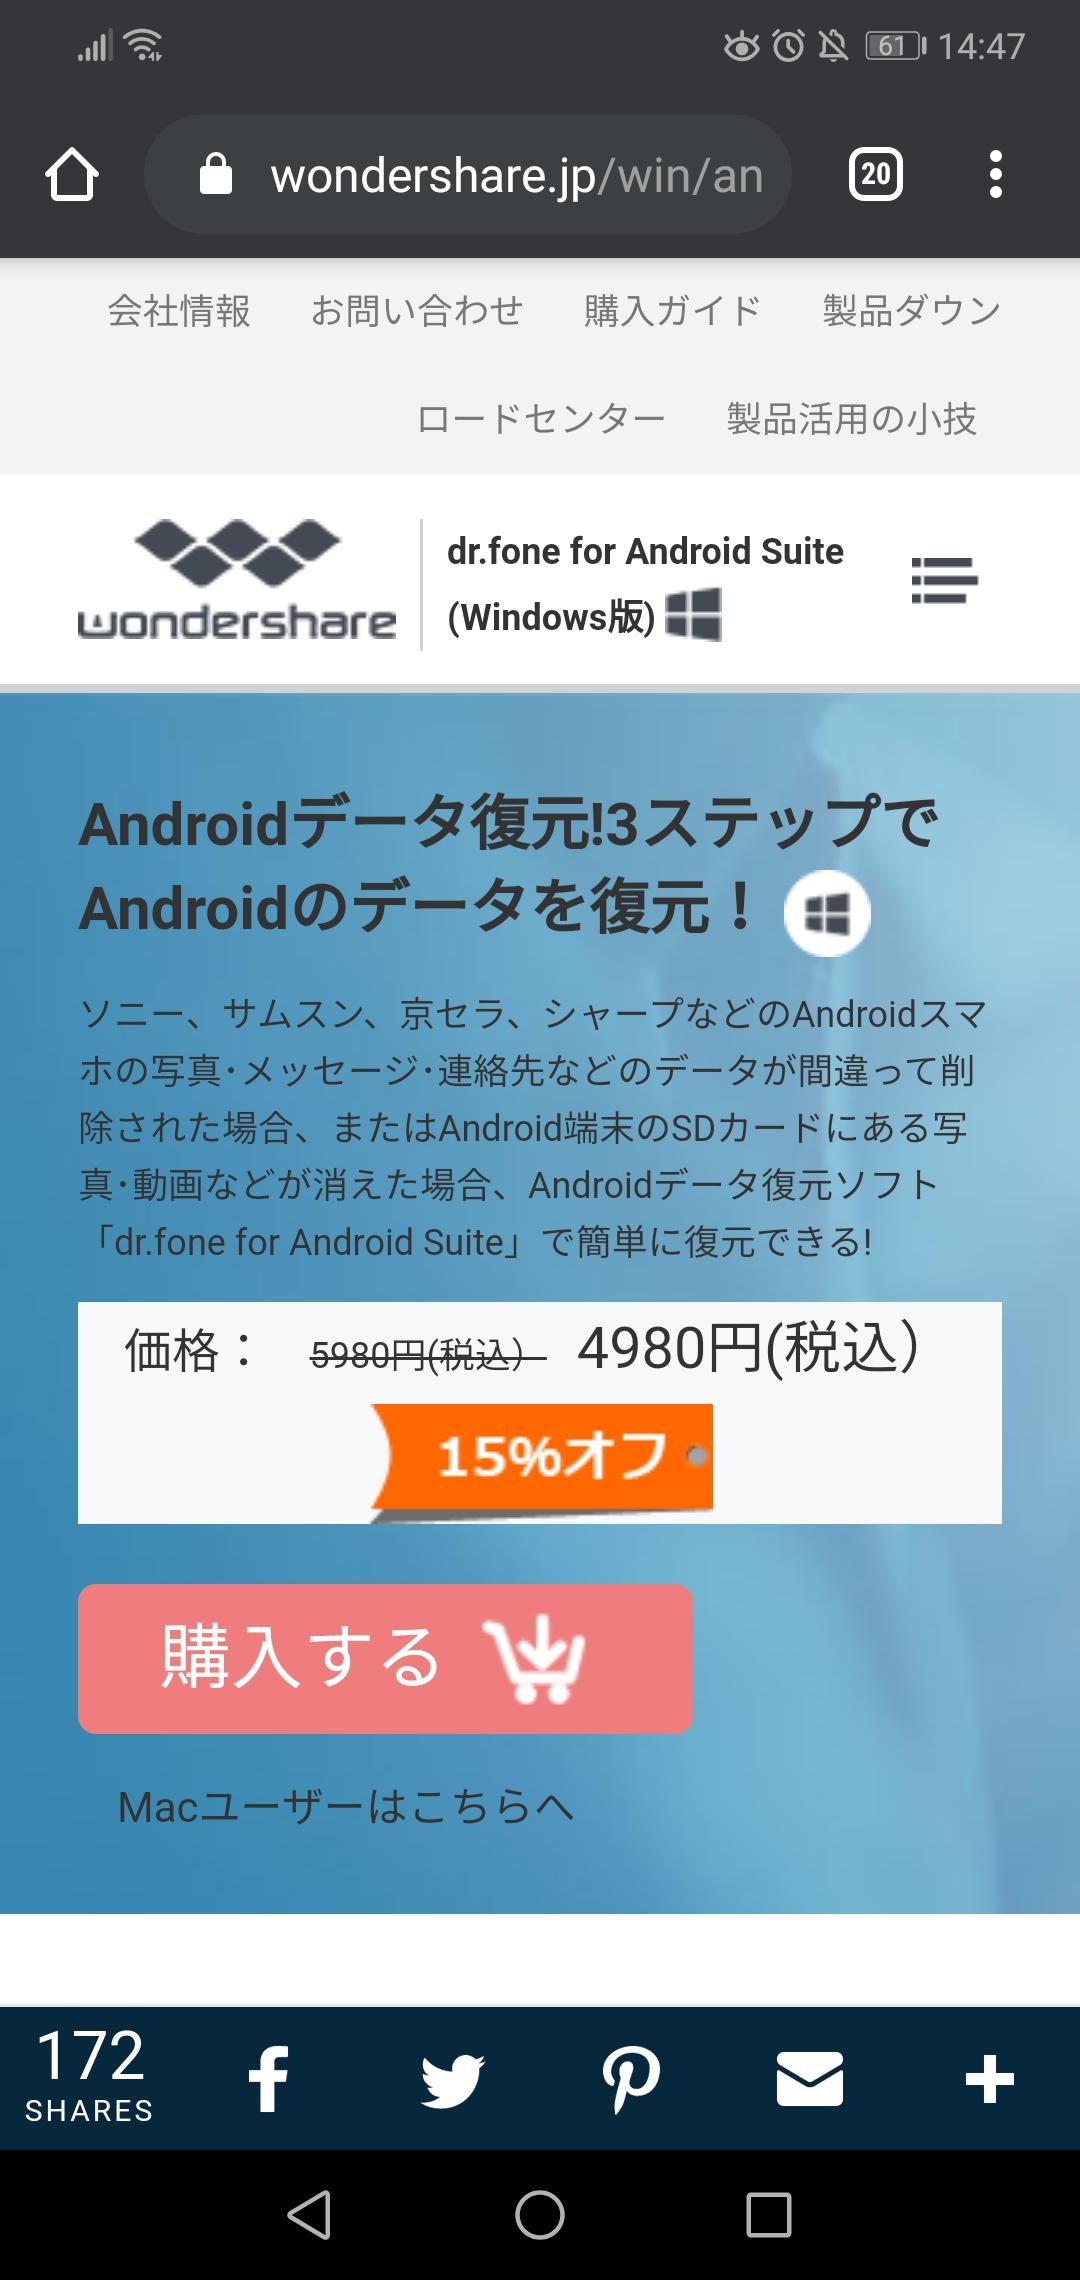 dr.fone-Androidデータ復元スクショ